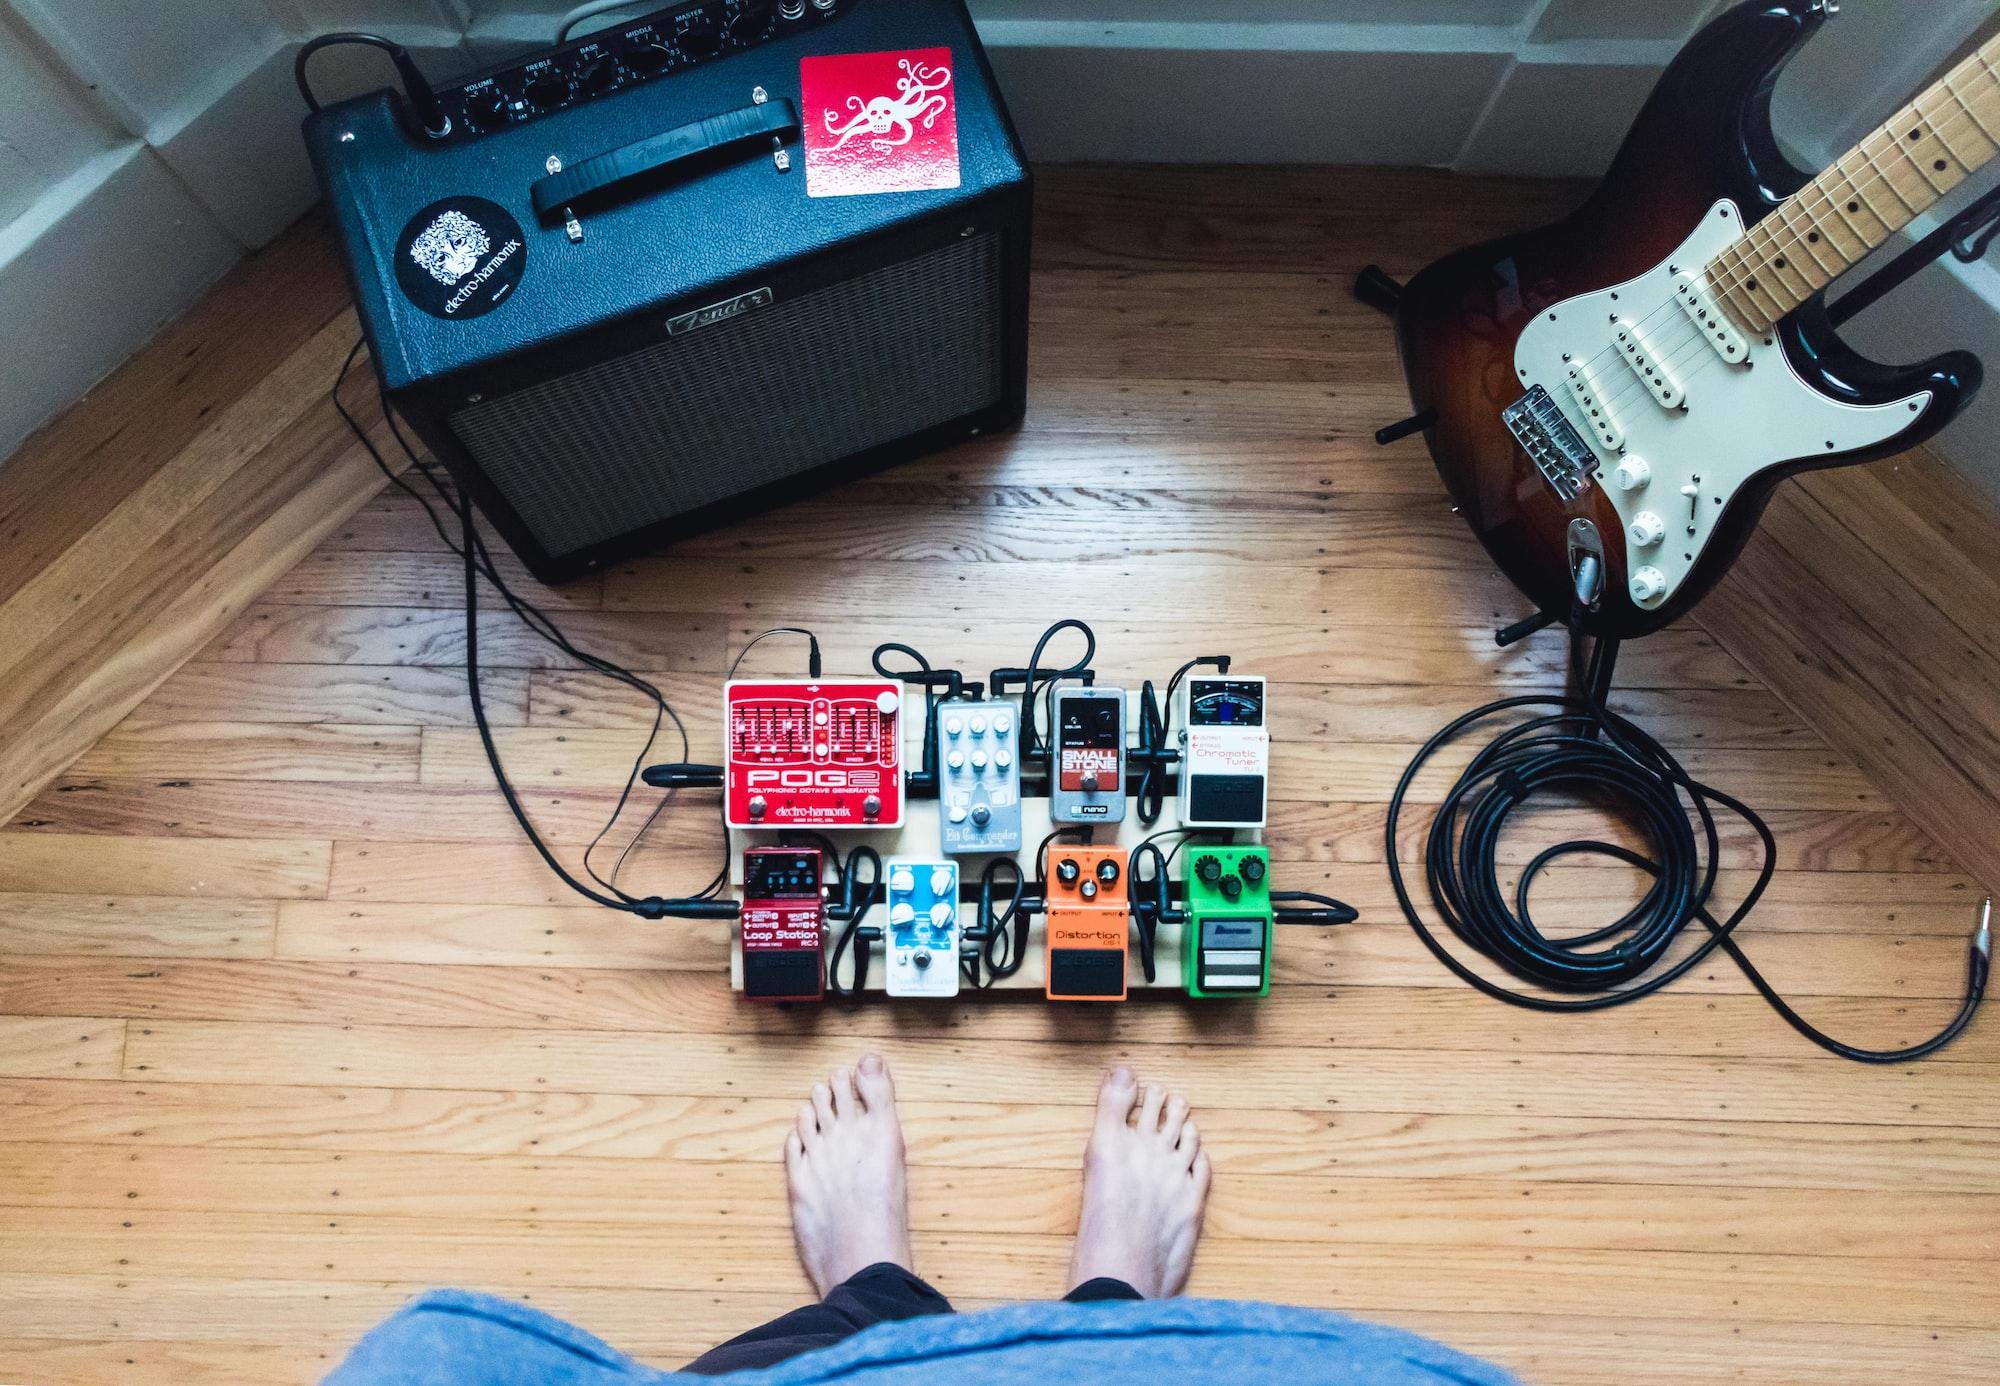 Guitar player gear looking